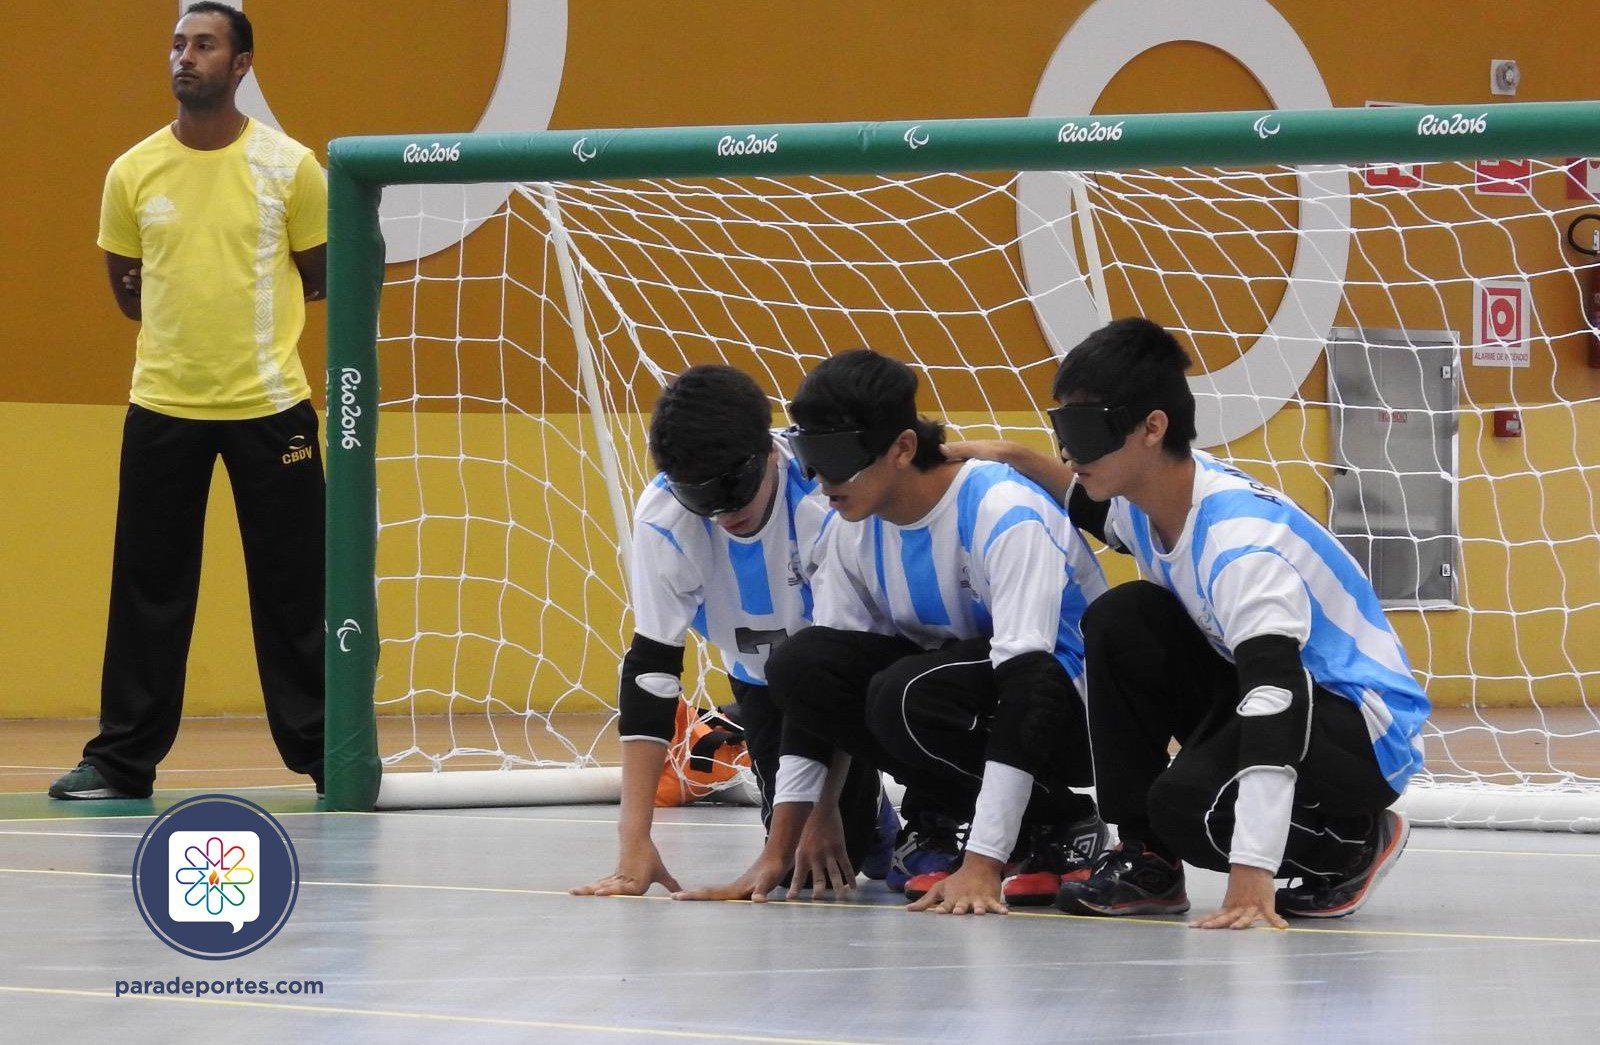 Goalball: Los Topitos en acción